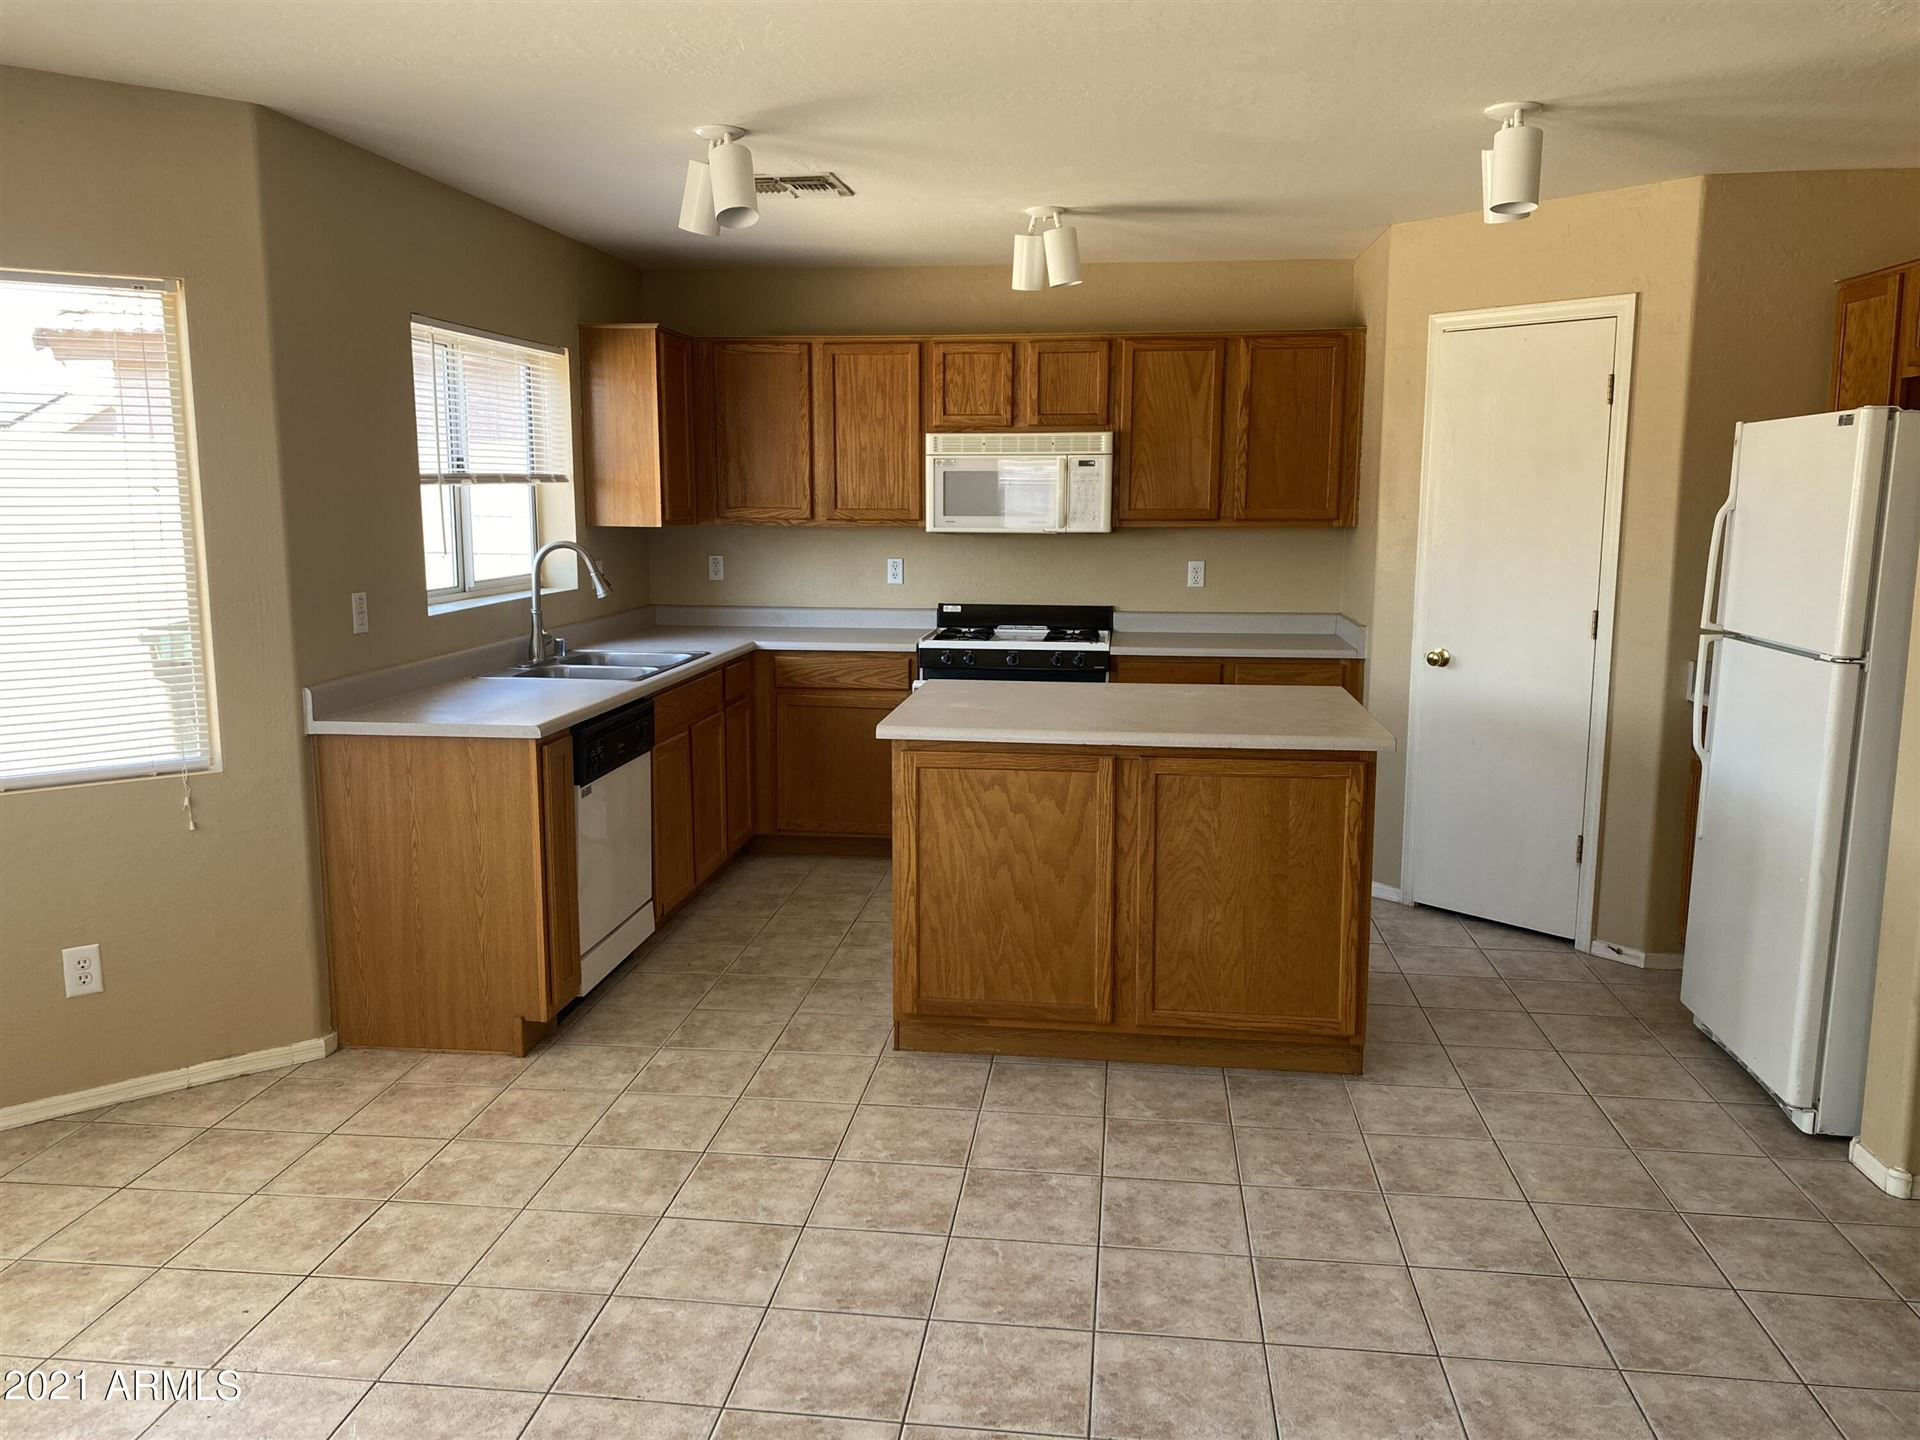 Photo of 12634 W WINDROSE Drive, El Mirage, AZ 85335 (MLS # 6262807)